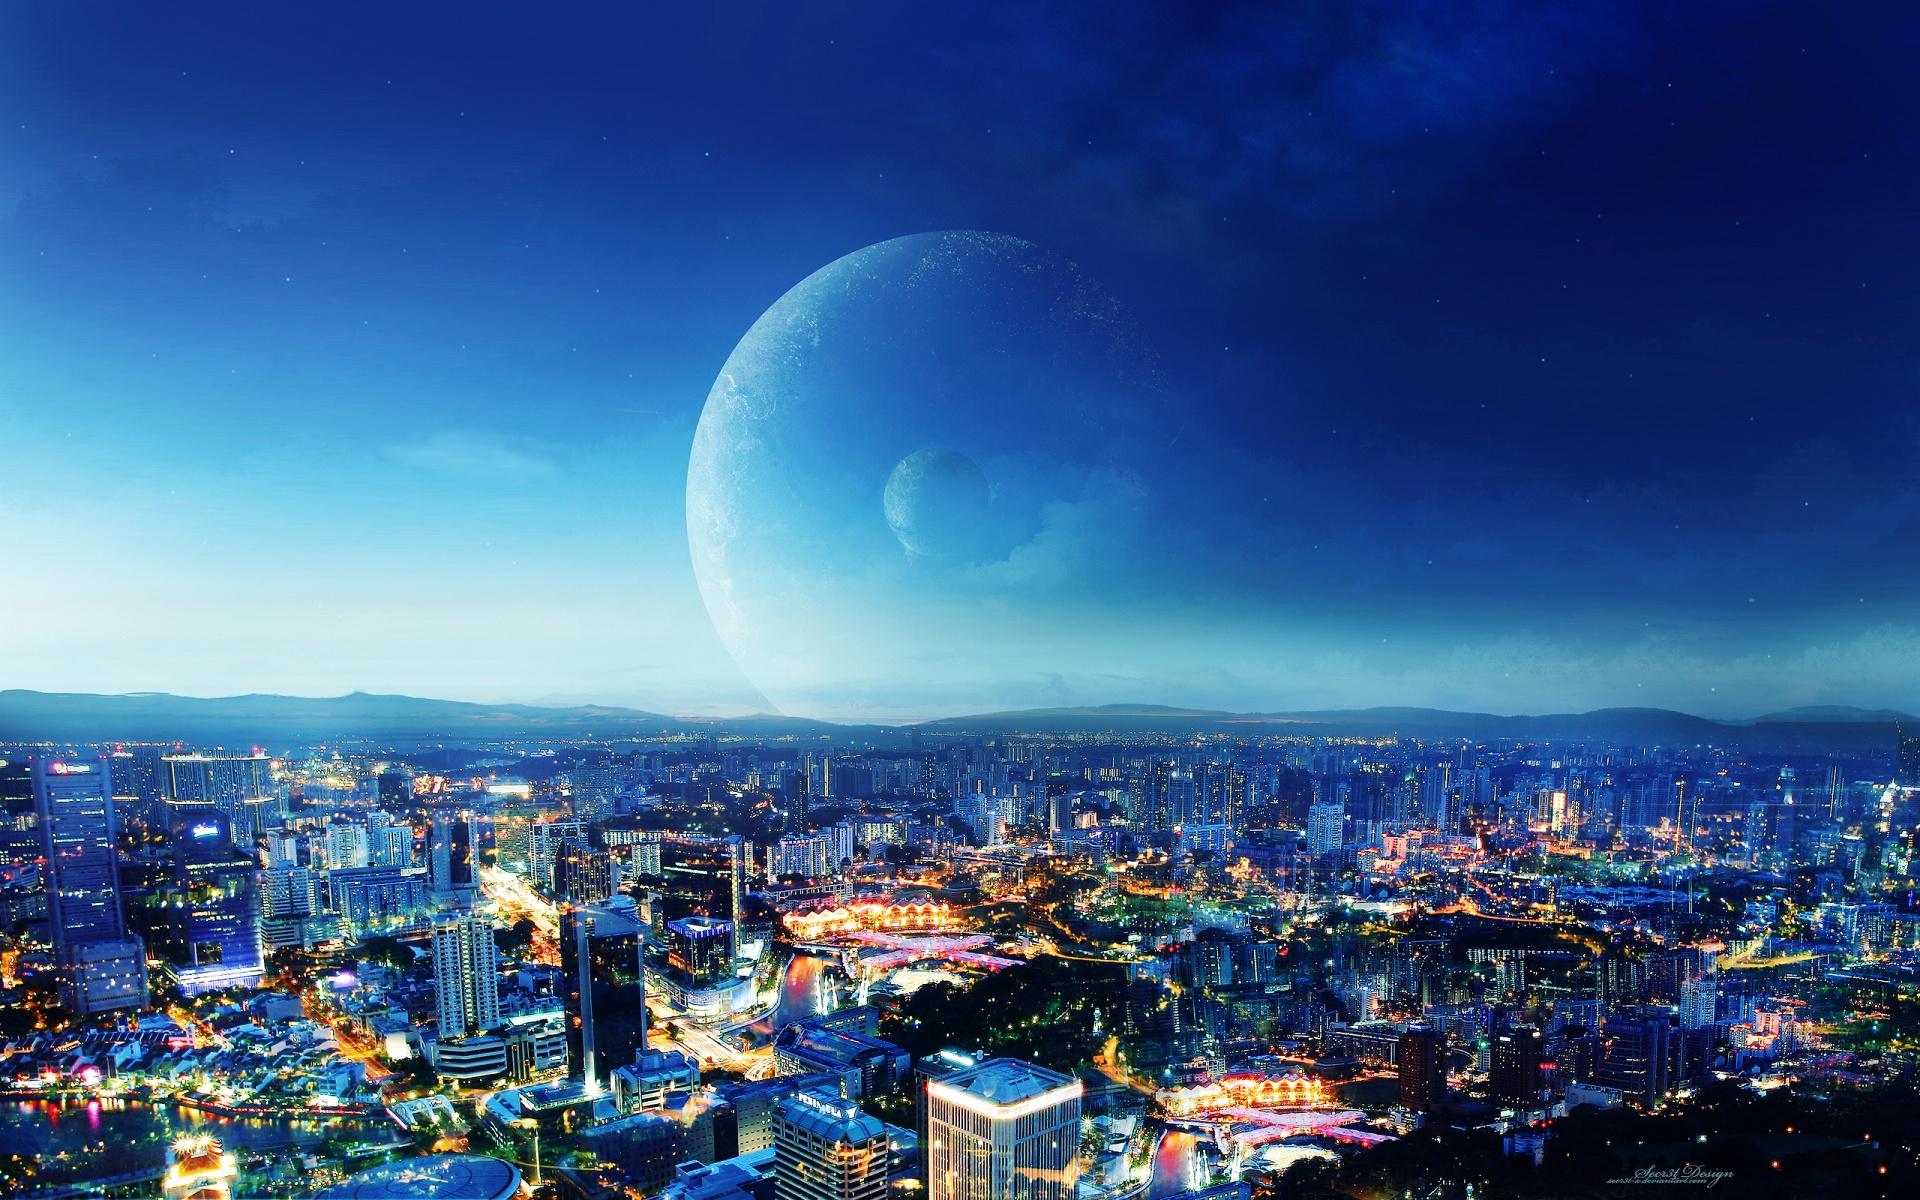 Fantasy Night Cityscape